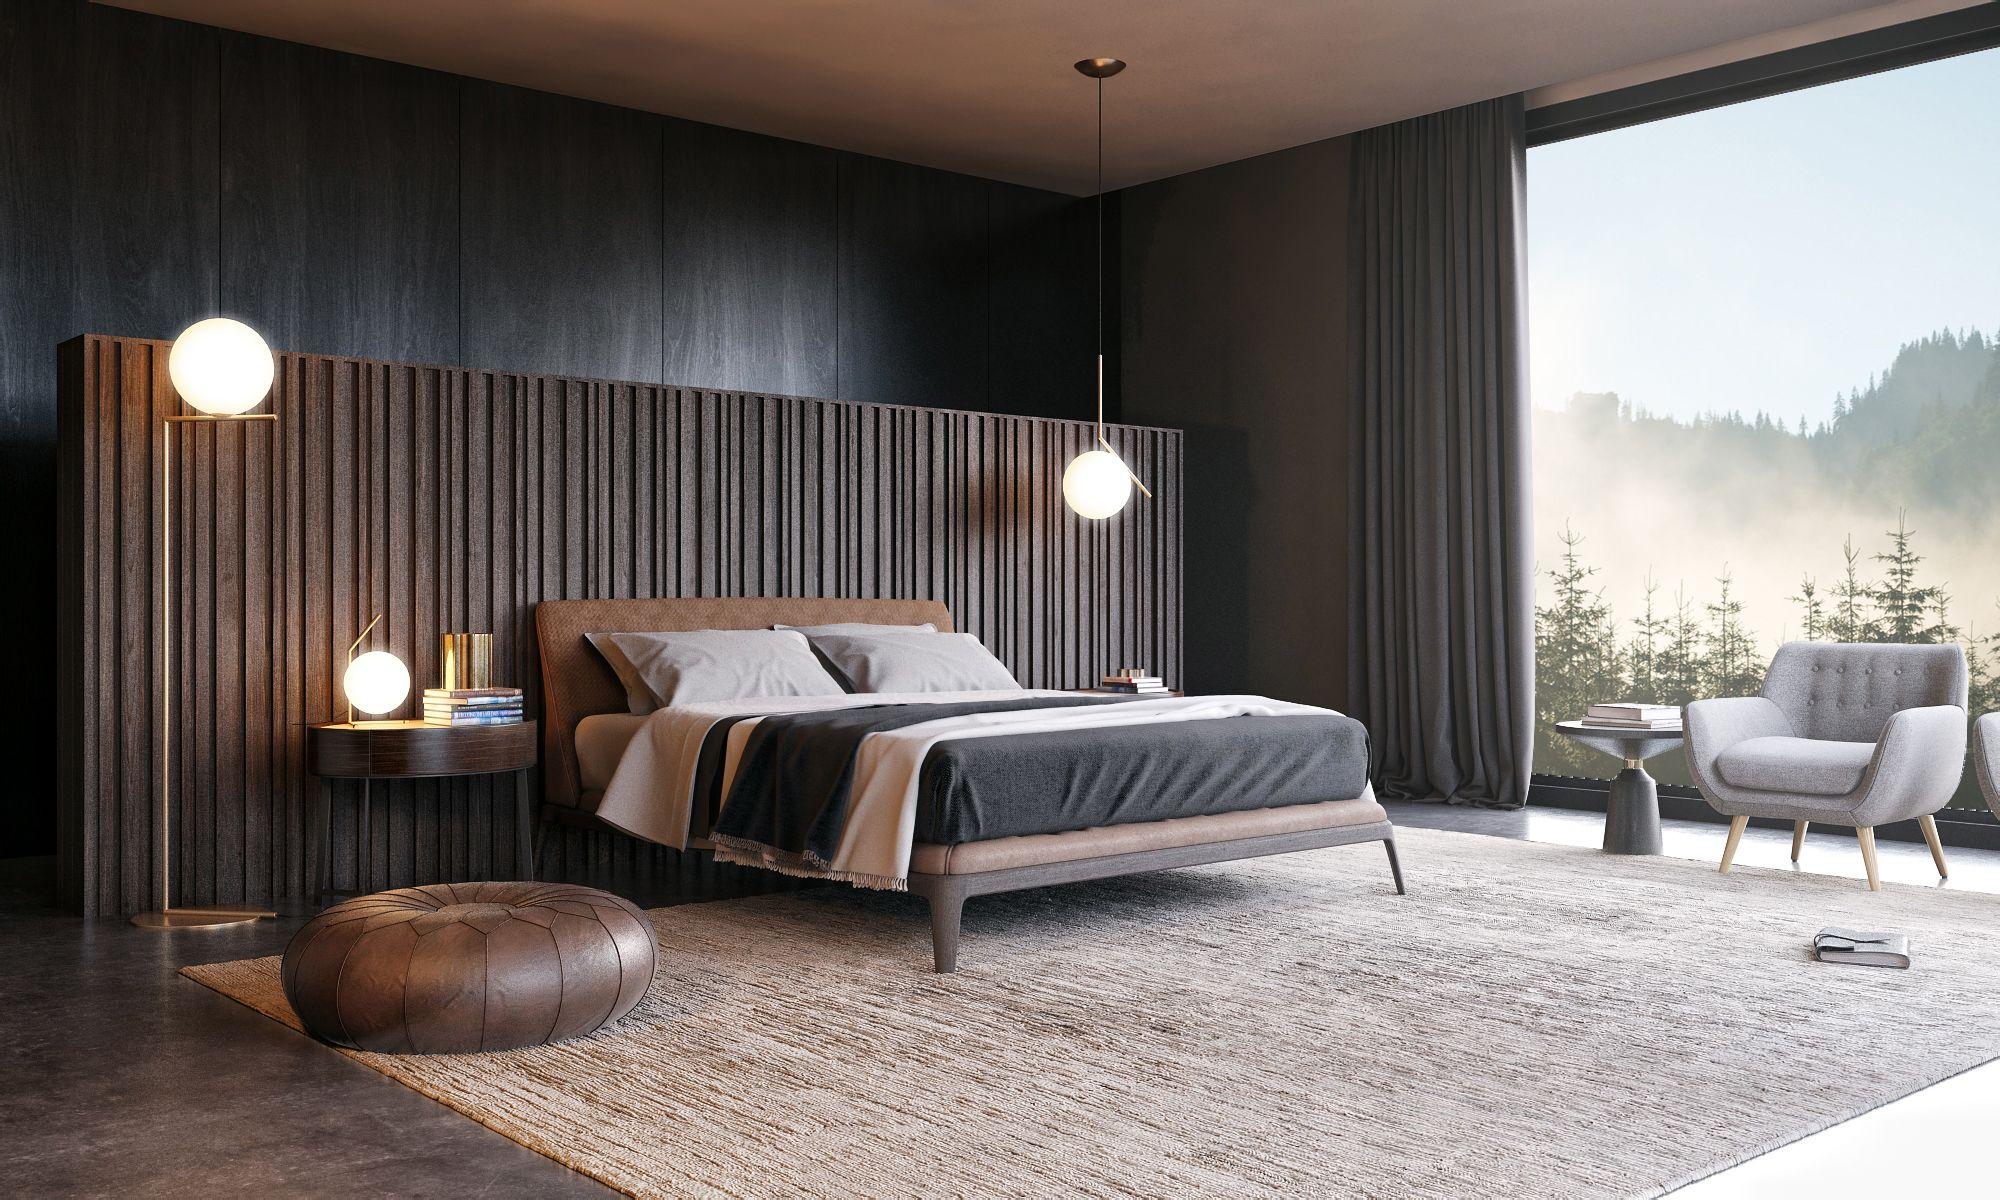 Bed Room Poliform On Behance - Interiors Bedroom - Pinterest